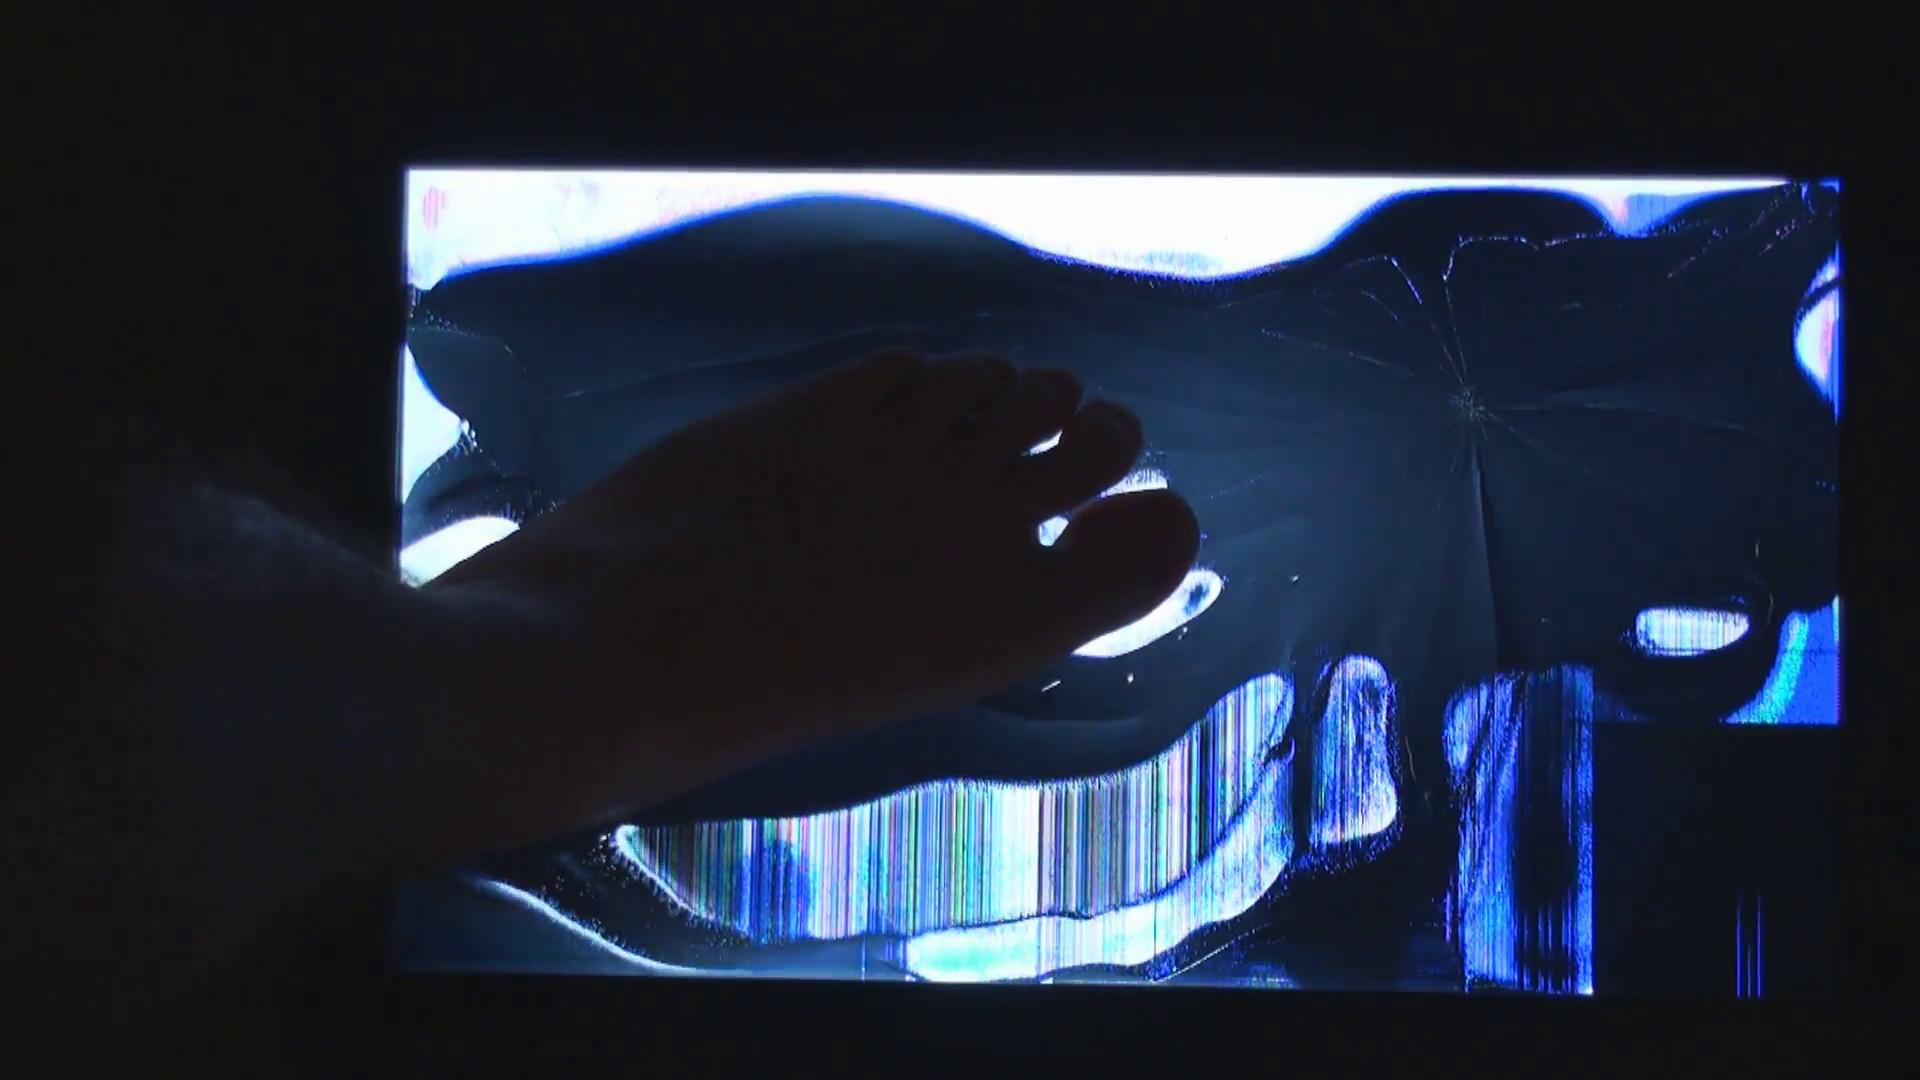 Placing a foot on broken LCD TV screen. Stock Video Footage – VideoBlocks